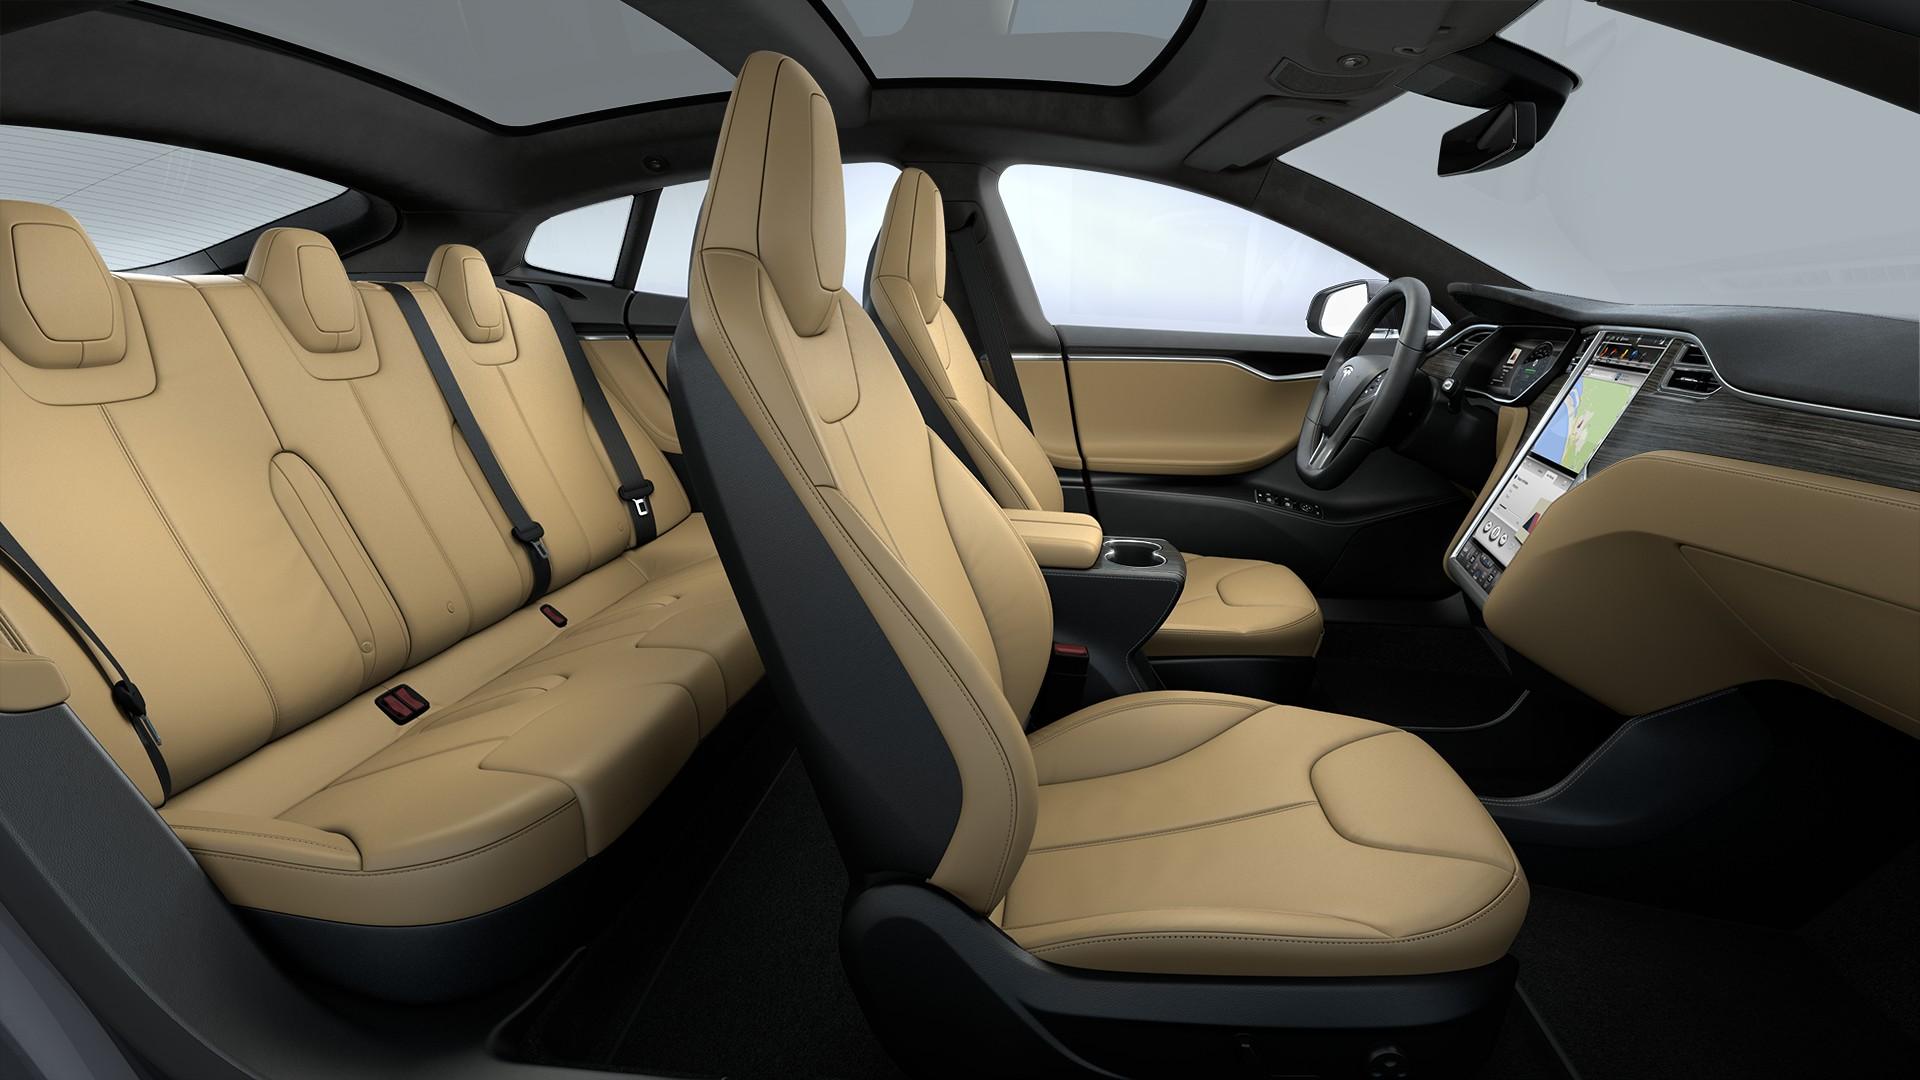 Interieur Tan Leather Seats Matte Obeche Wood Decor Black Alcantara Headliner Alcantara Dashboard Accents